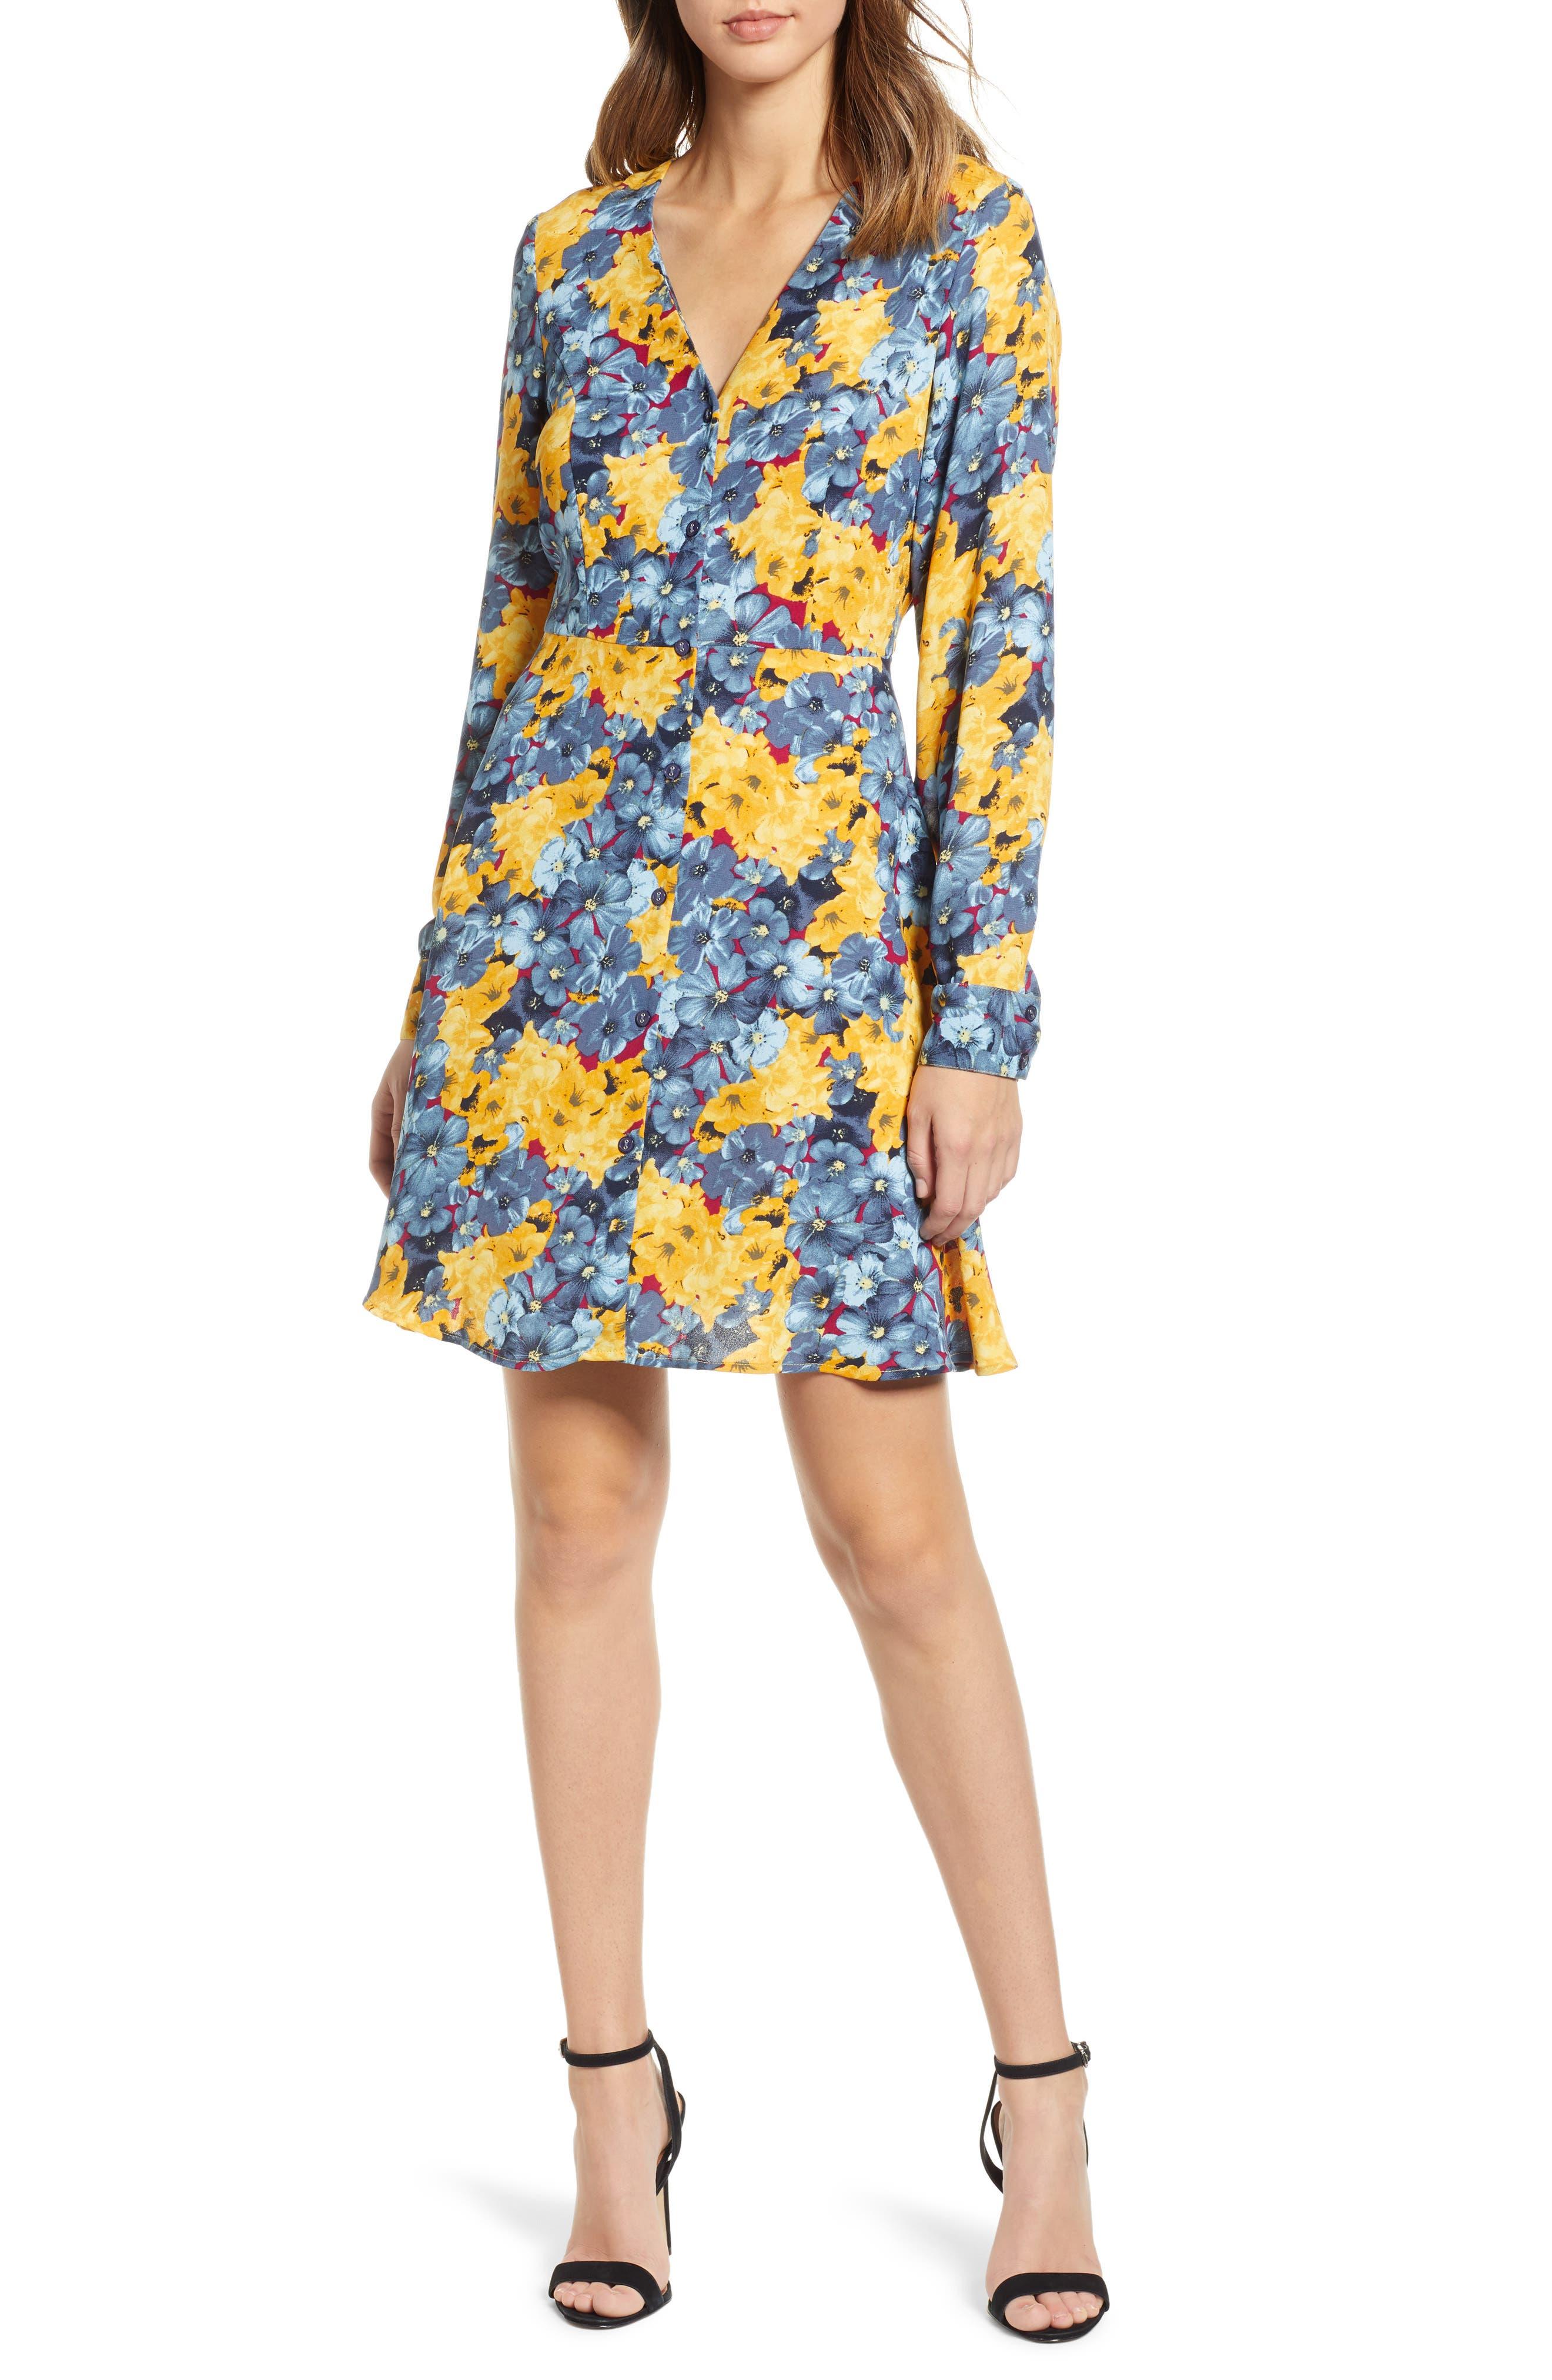 VERO MODA Mille Floral Print Minidress in Smoke Blue/ Mille Print